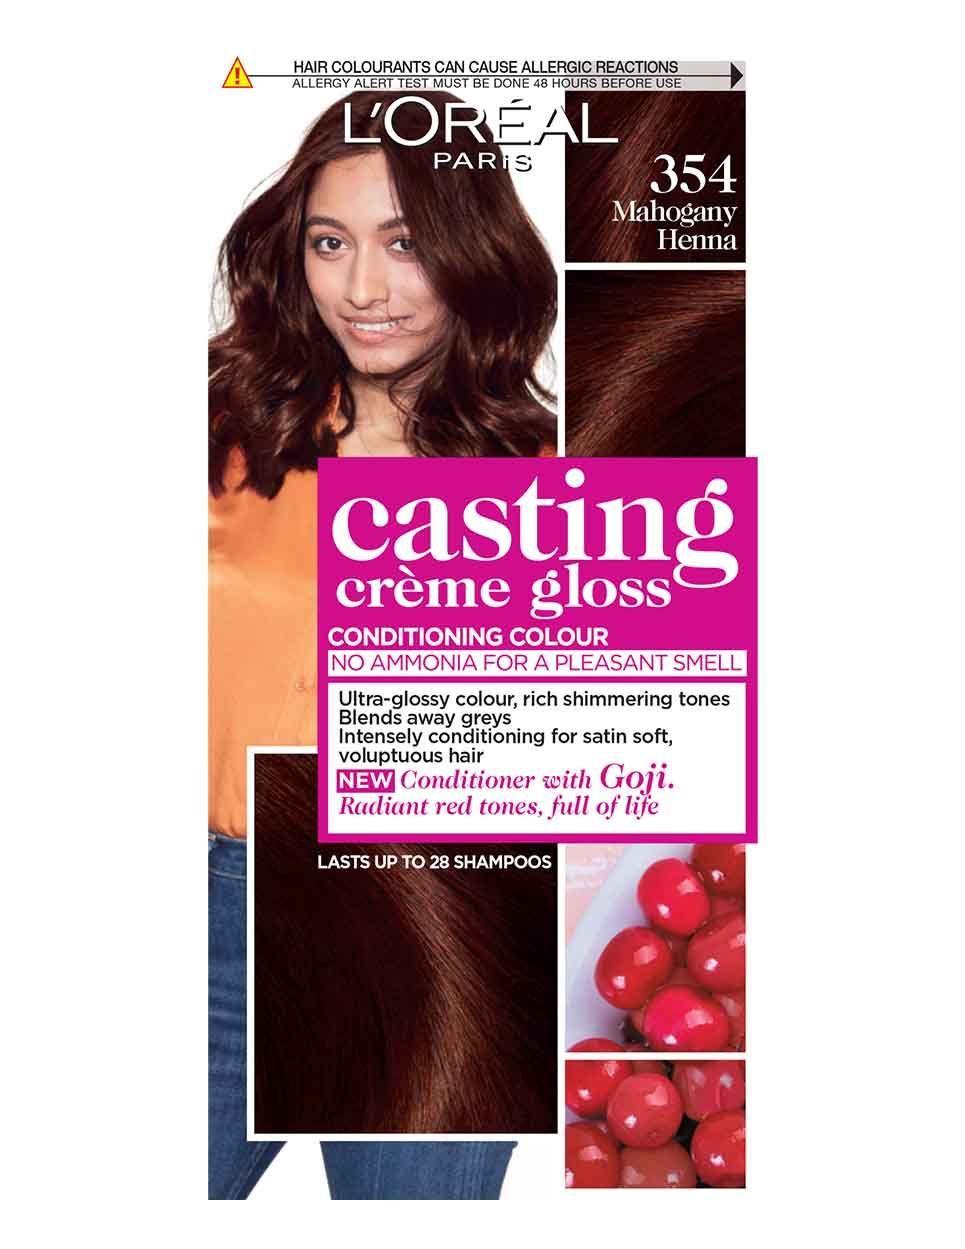 Casting Creme Gloss 530 Praline Semi Permanent Co Loreal Casting Creme Gloss Loreal Creme